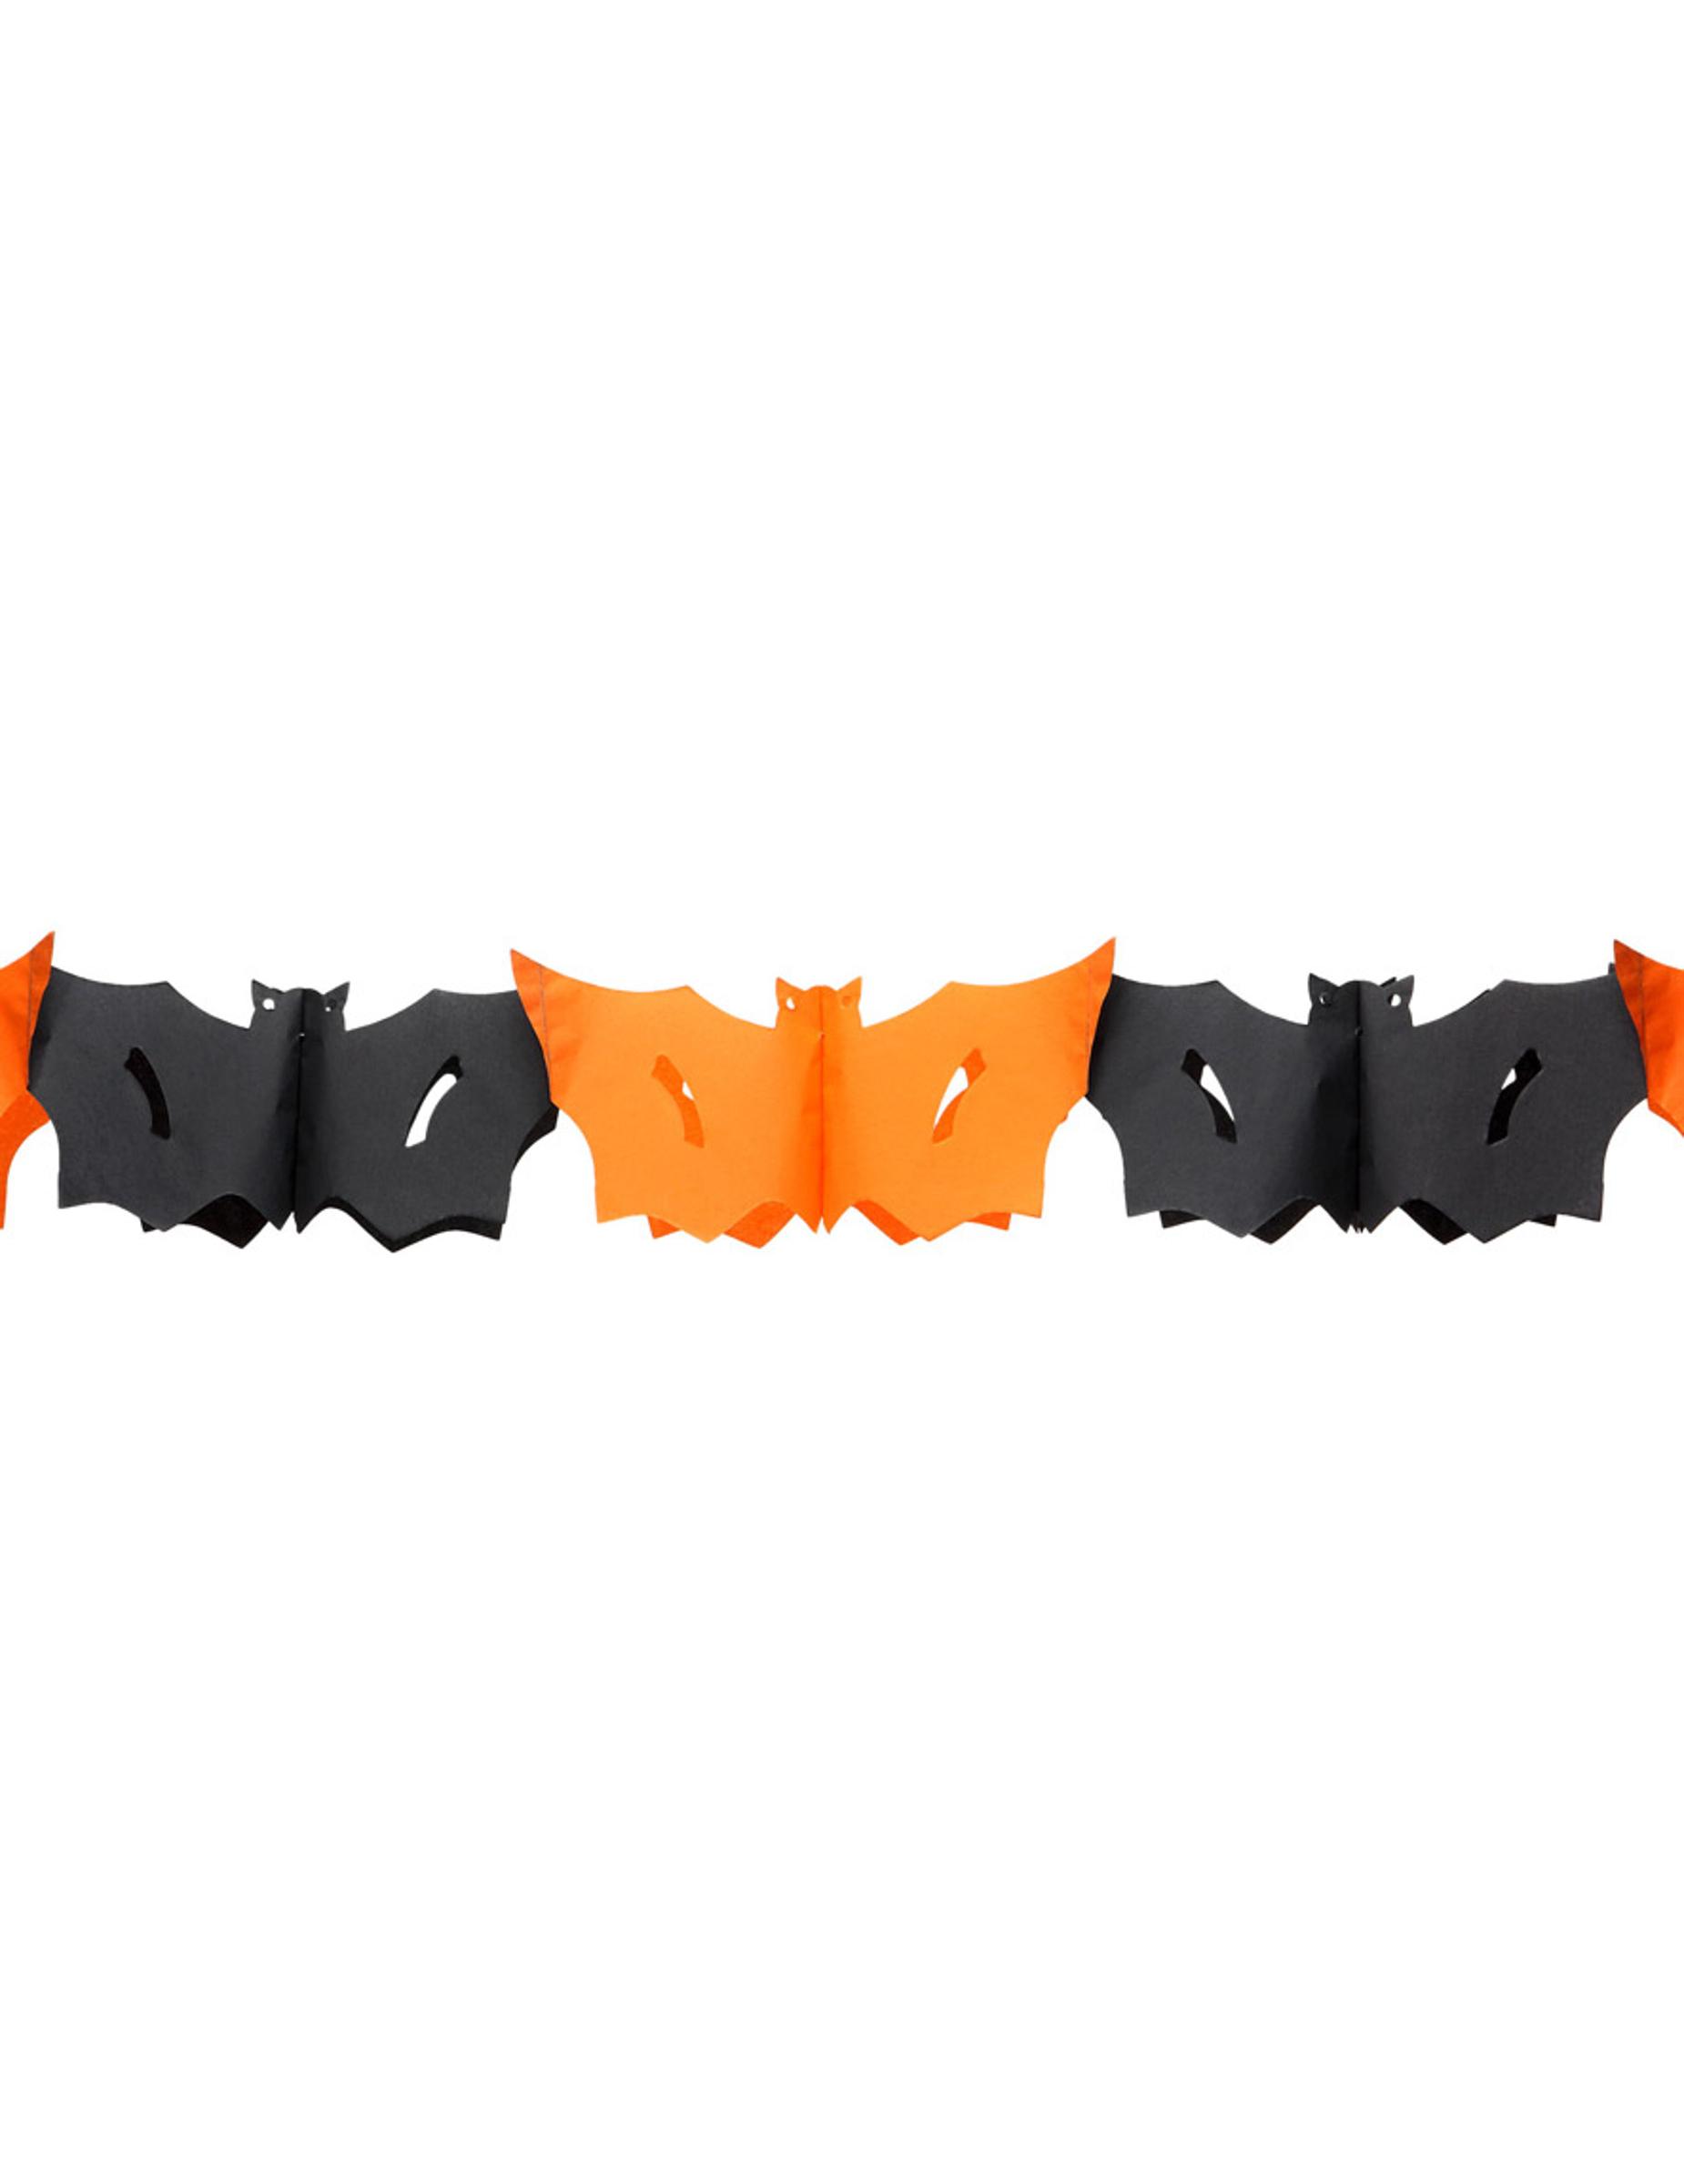 Decorazione Per Halloween Ghirlanda Pipistrelli Addobbi